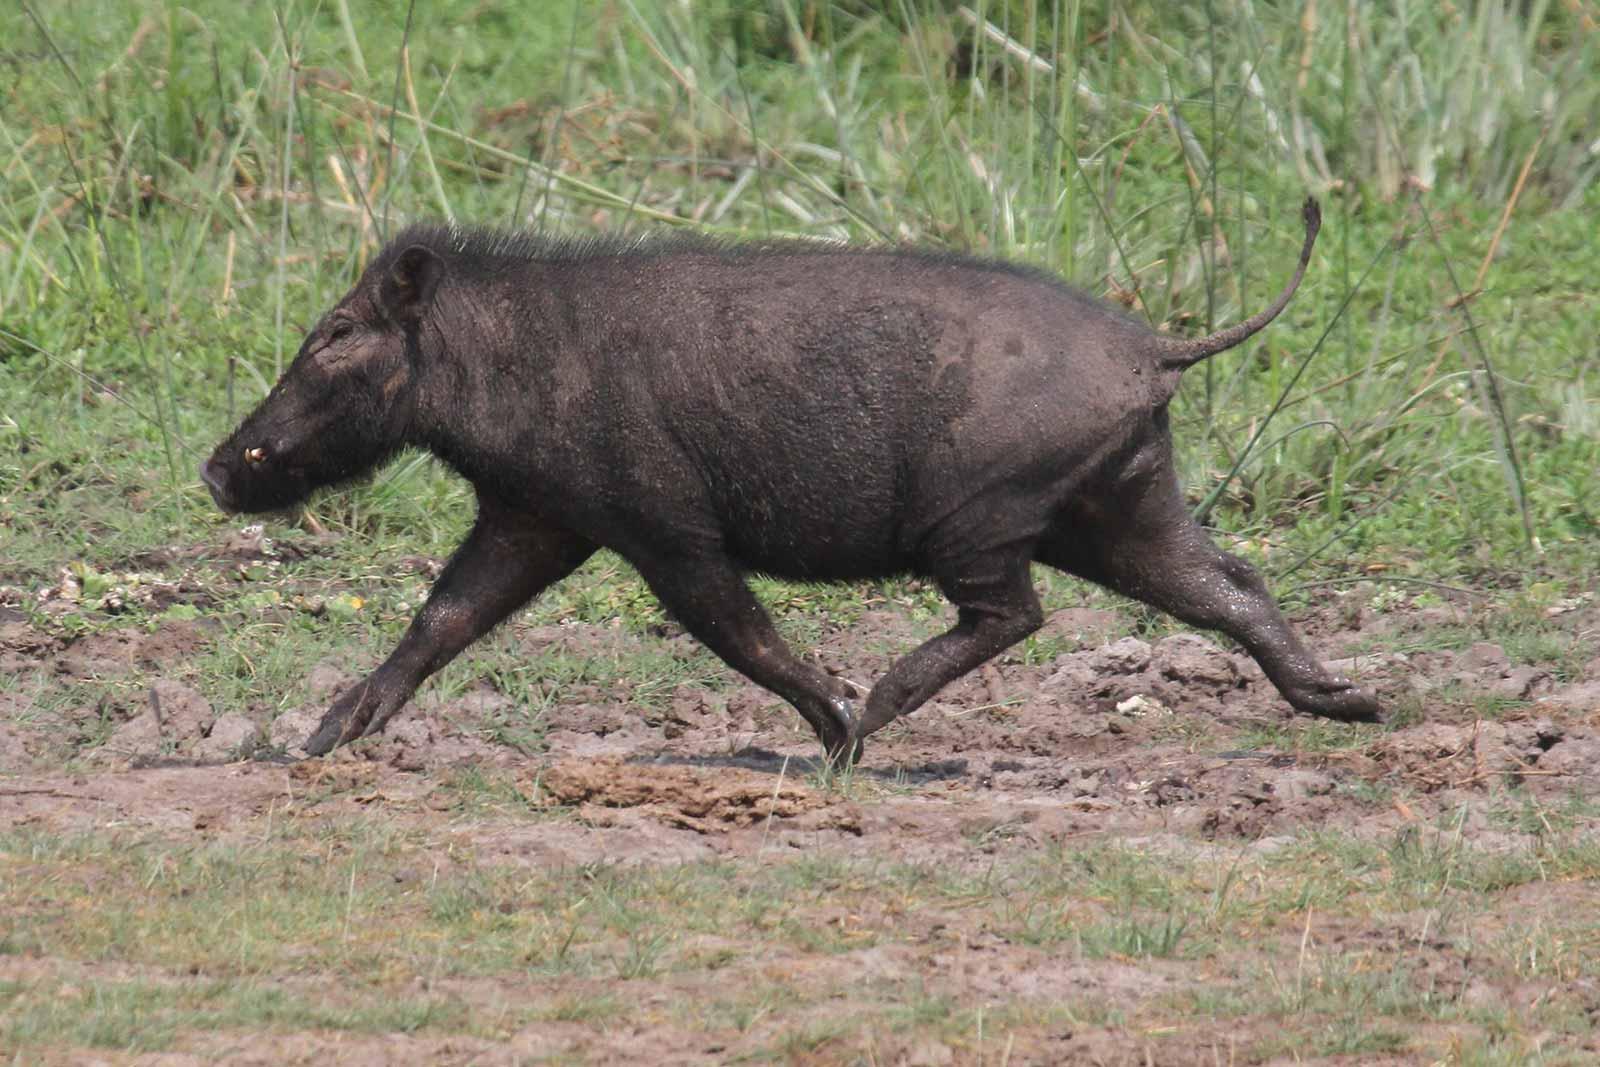 giant forest hog (Hylochoerus meinertzhageni)